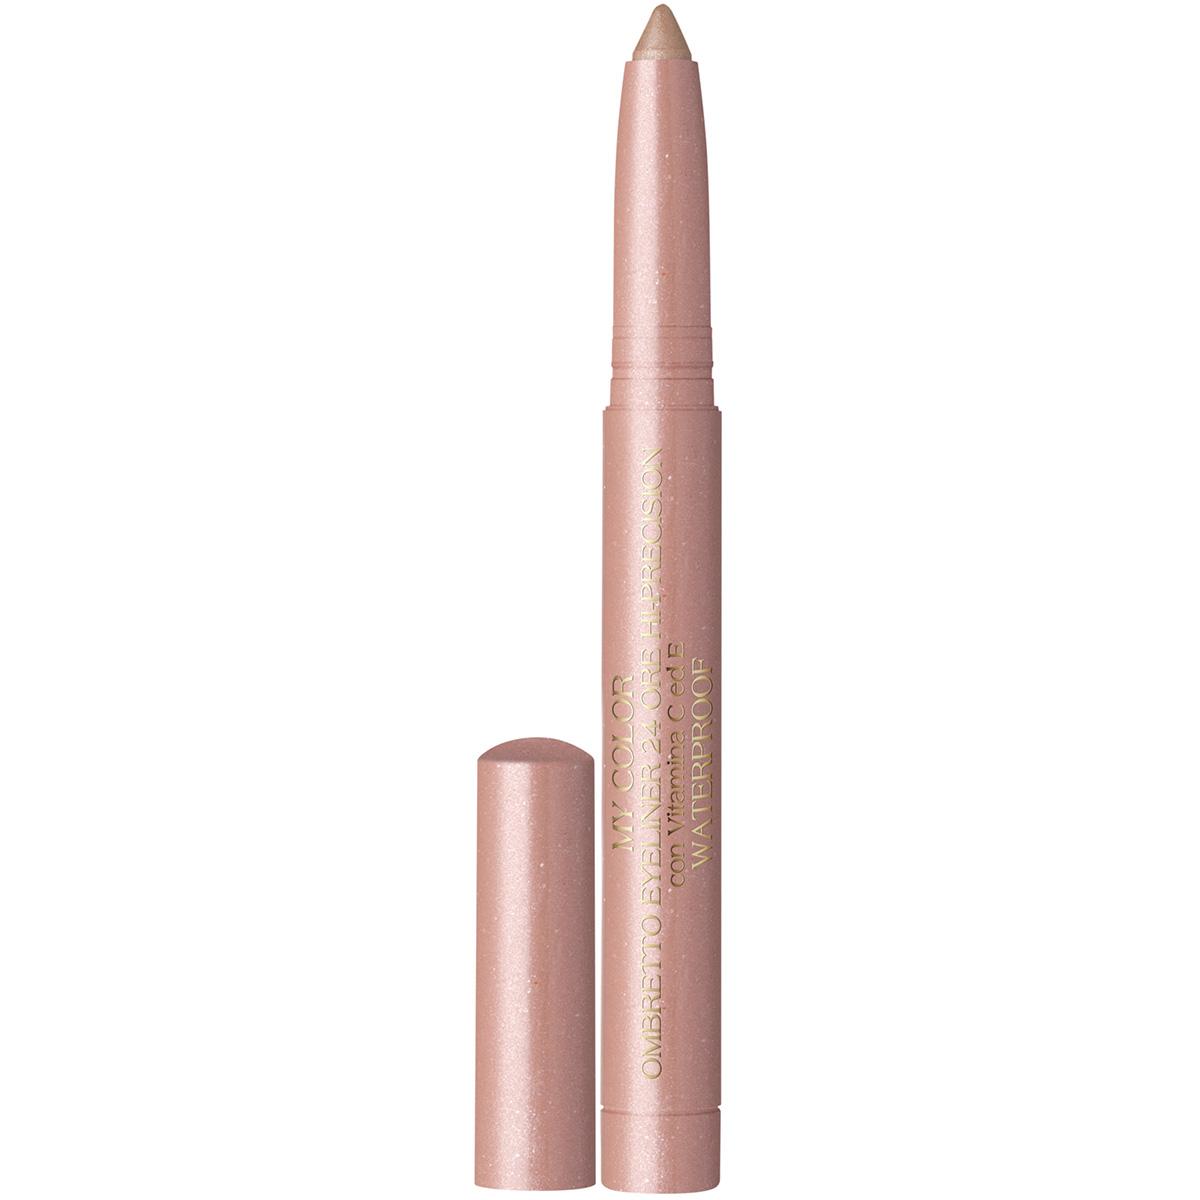 My Color - Fard De Pleoape Stick- 24 Ore  Cu Vitaminele C Si E - Rezistent La Apa